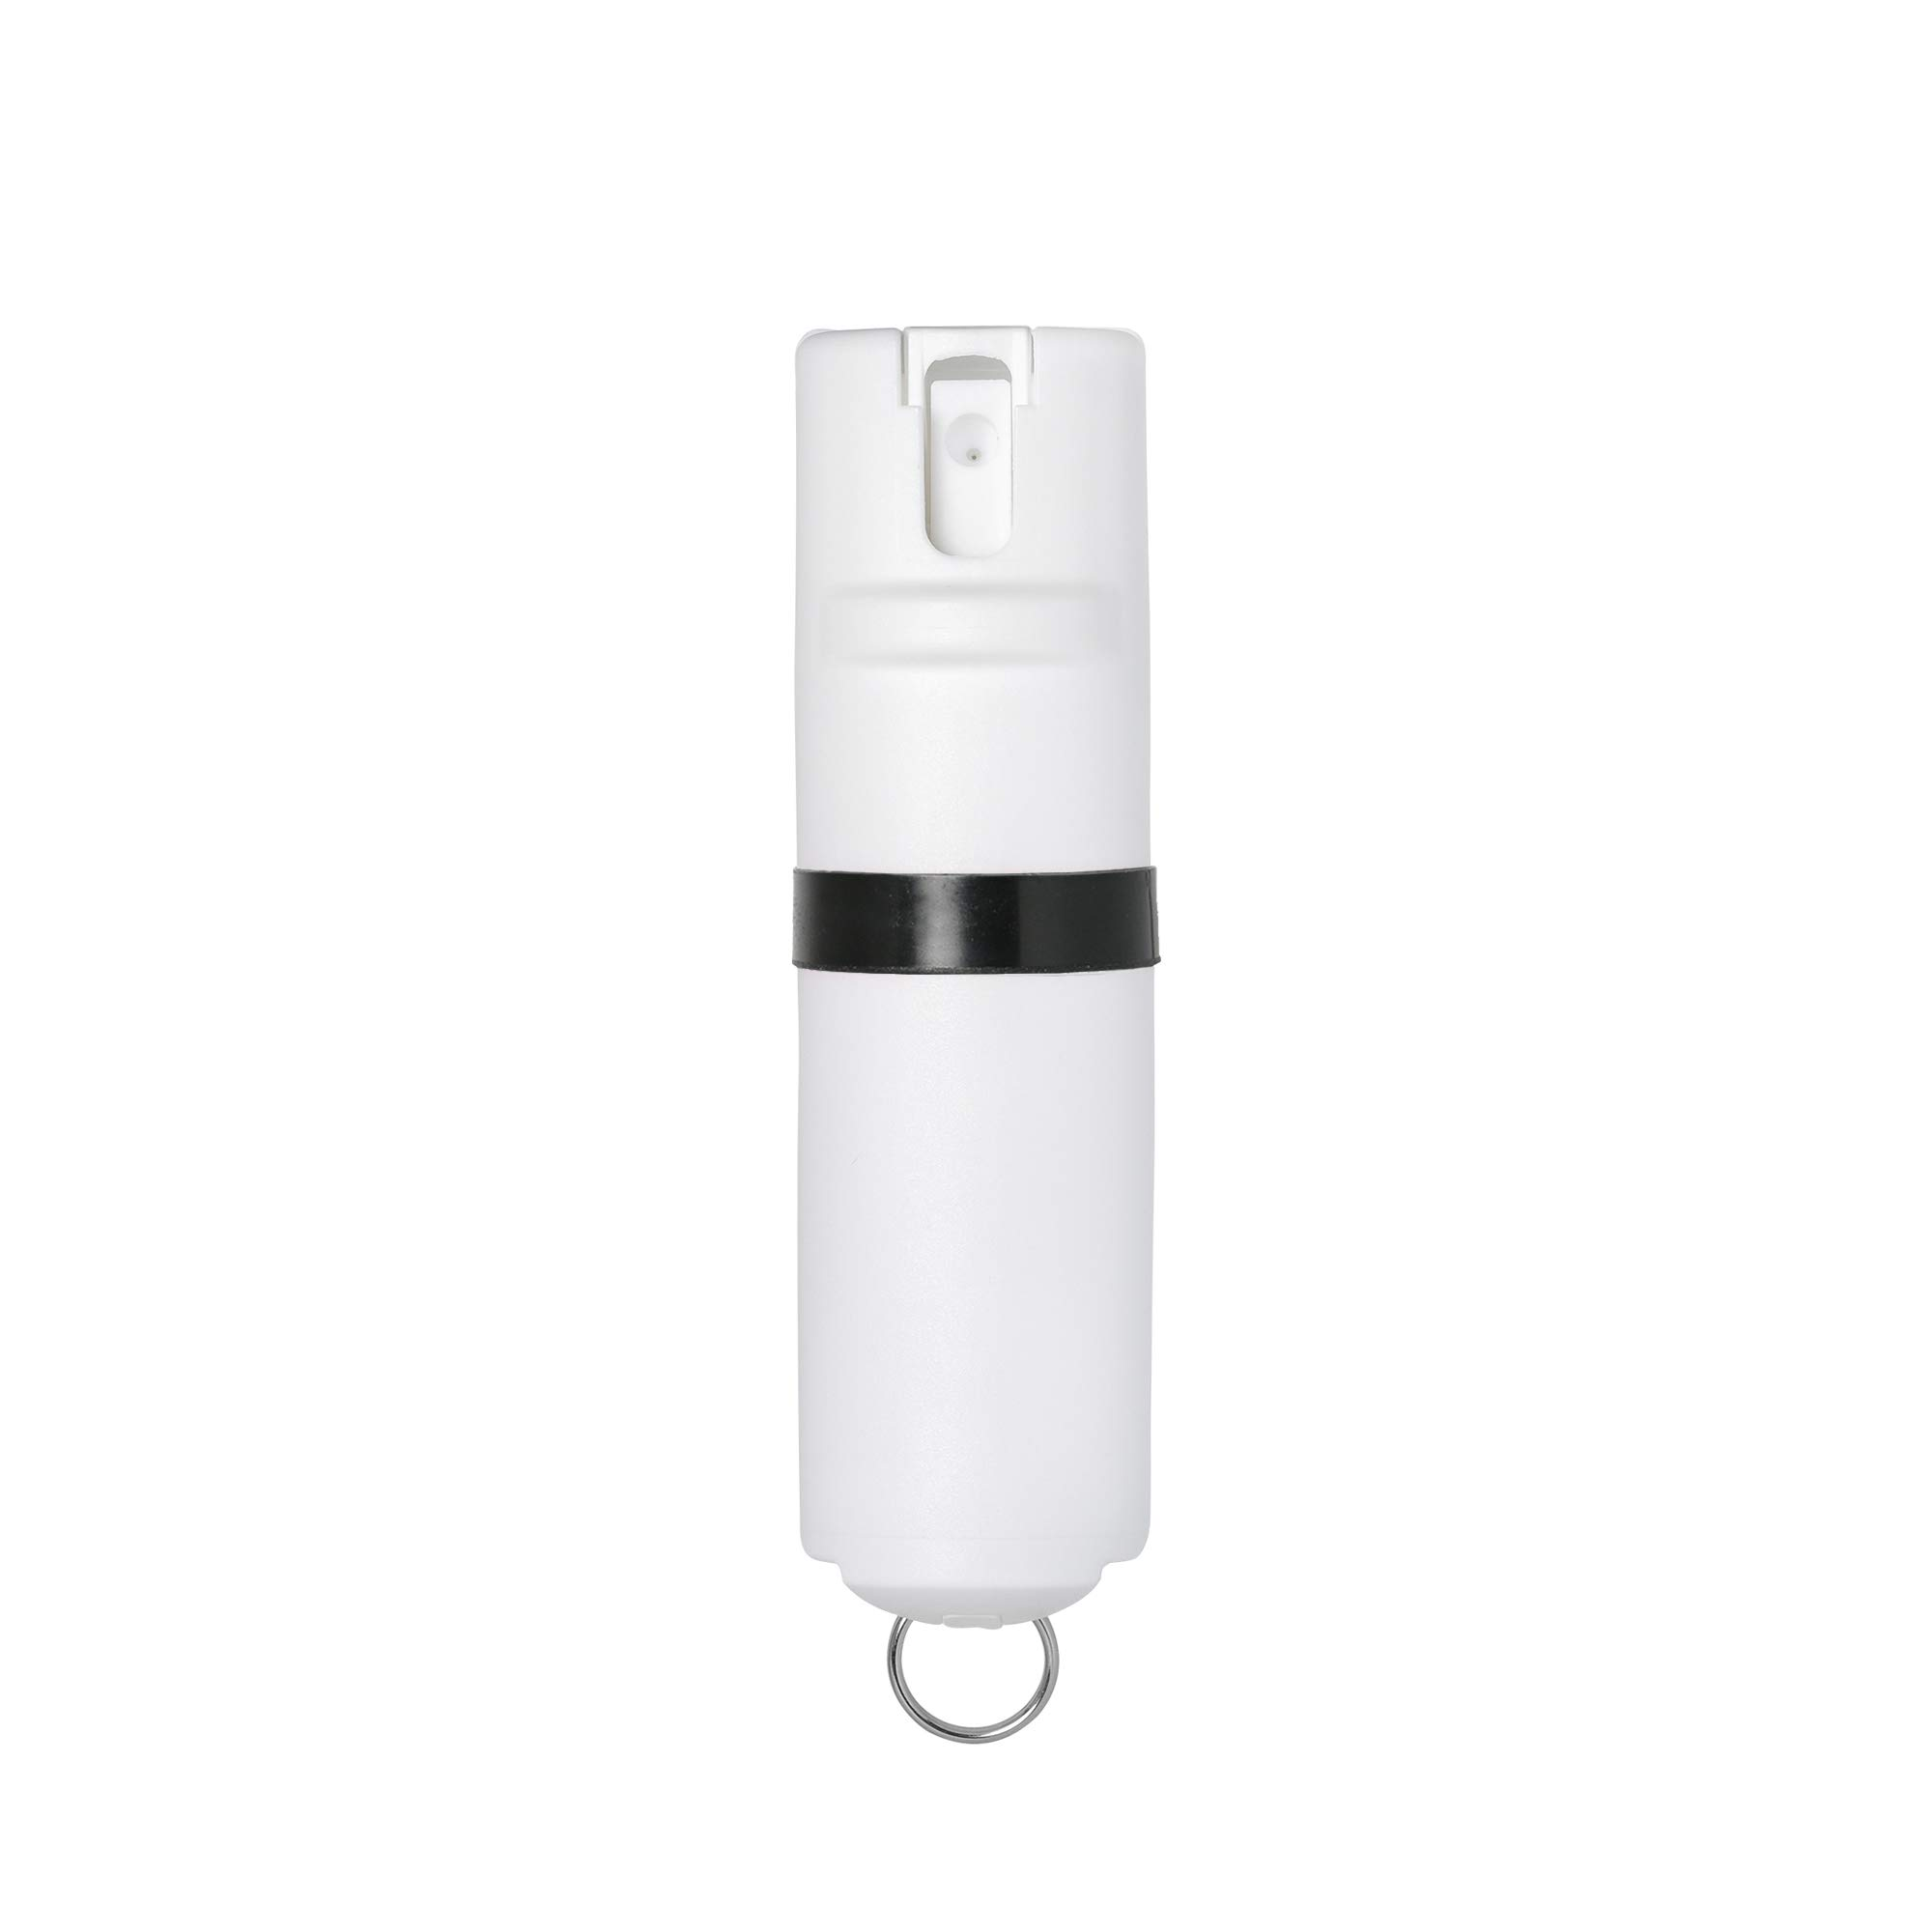 POM White Pepper Spray Keychain Model - Maximum Strength Self Defense OC Spray Safety Flip Top 10ft Range Compact Discreet for Keys Backpack Quick Key Release (Black) by POM